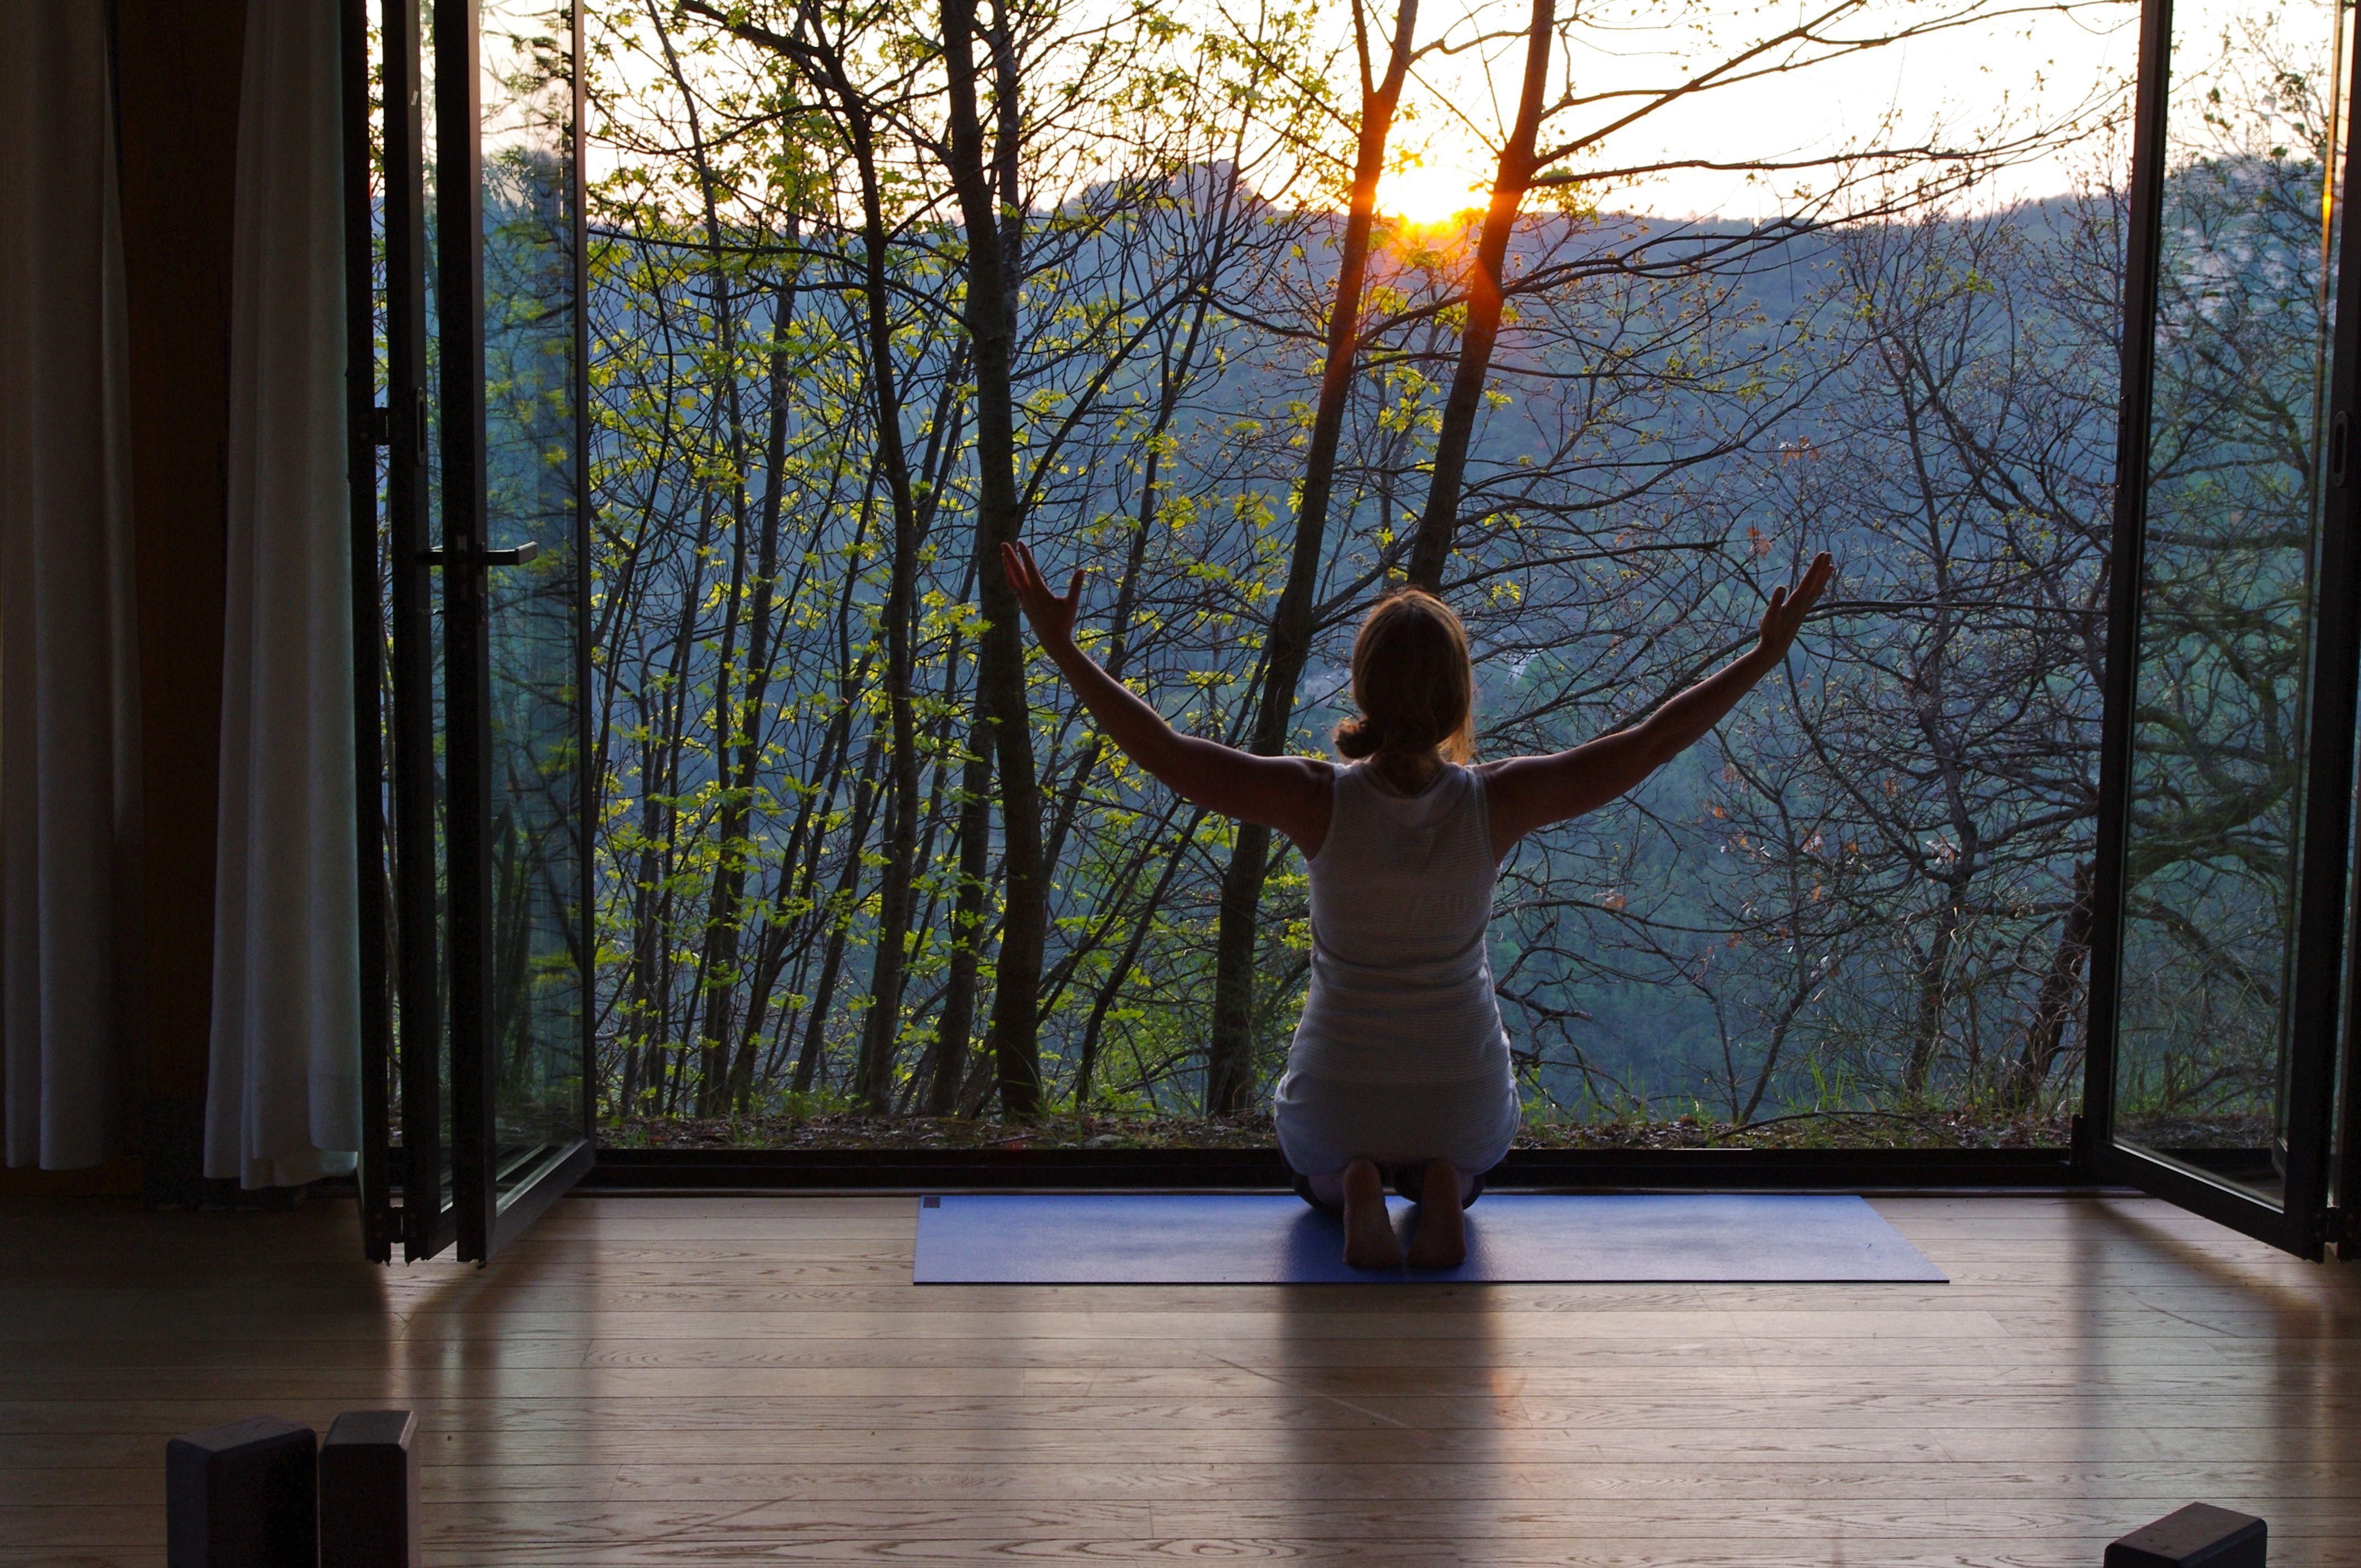 Umbria Italy Yoga Retreat Http Www Alicampbellyoga Com Yoga Retreat Umbria Italy Retreat